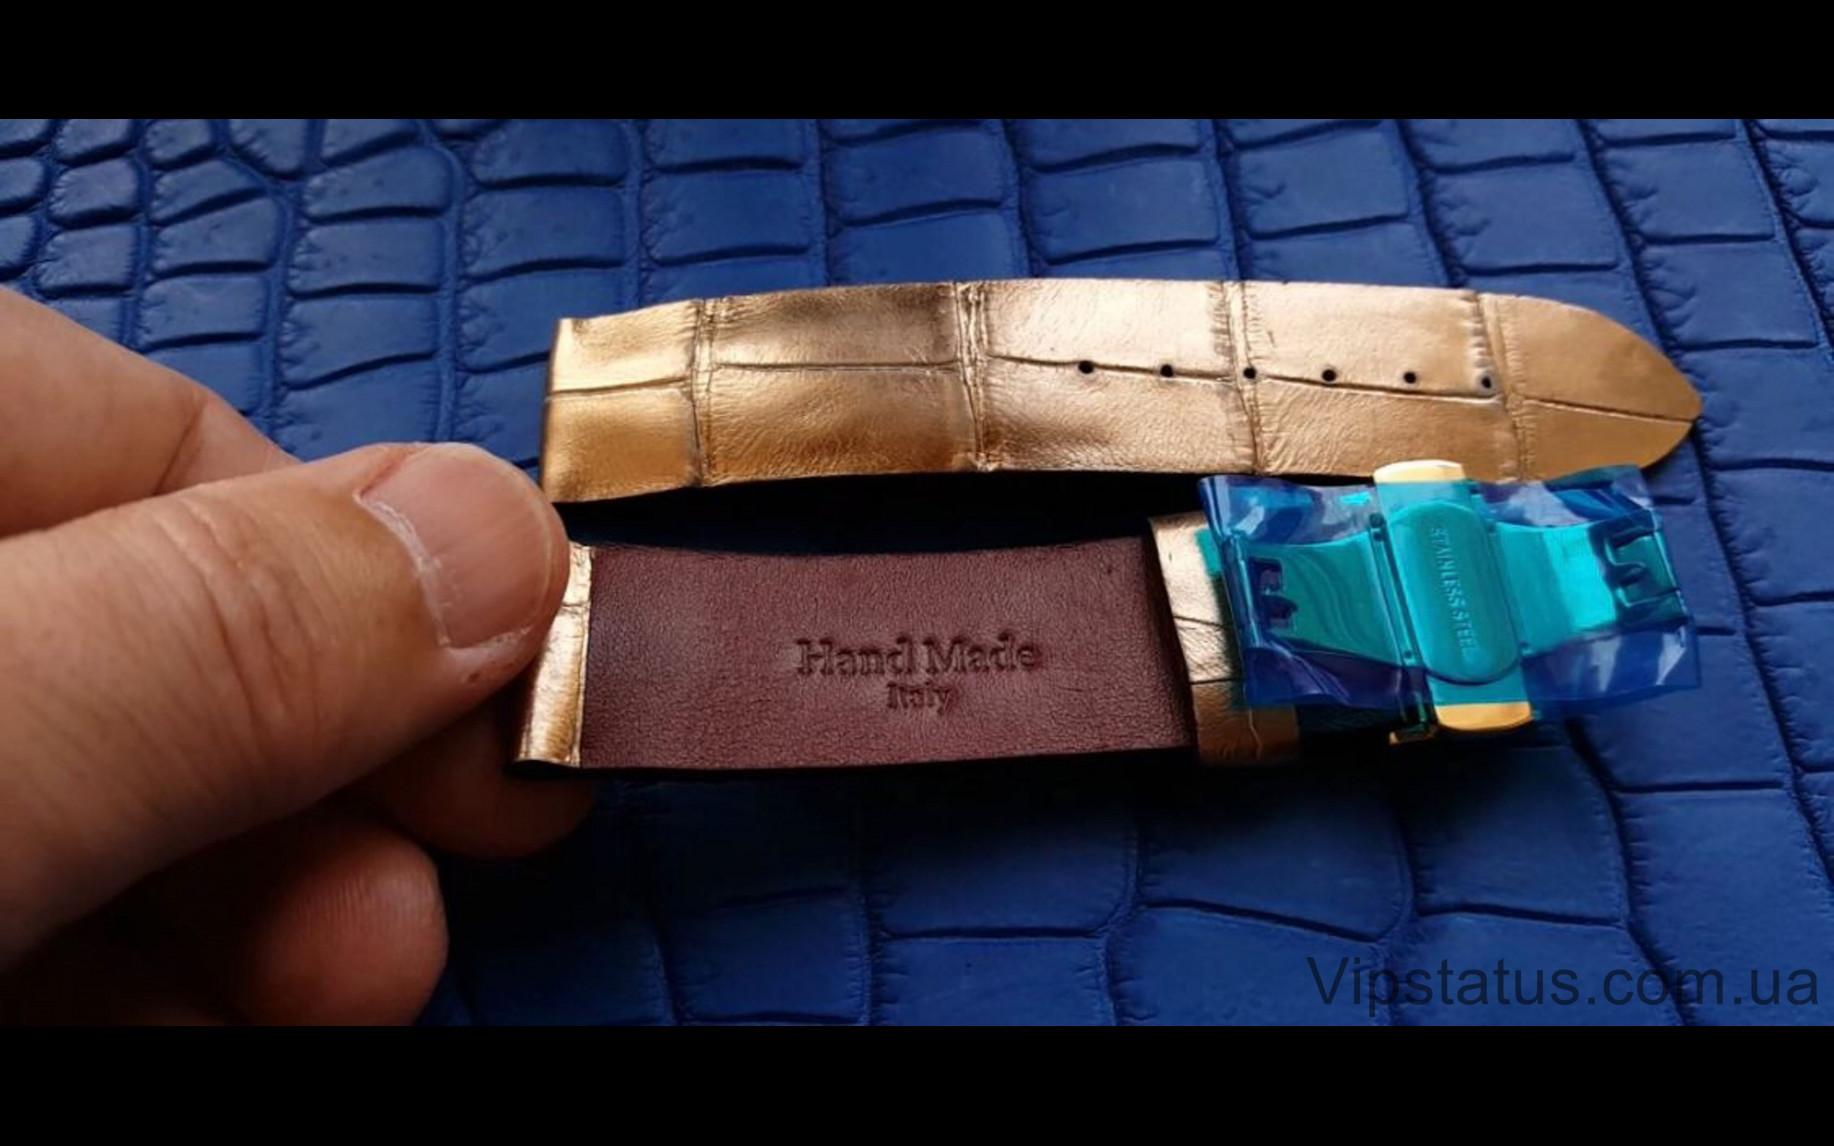 Elite Экзотический ремешок для часов Audemars Piguet кожа крокодила Exotic Crocodile Strap for Audemars Piguet watches image 2